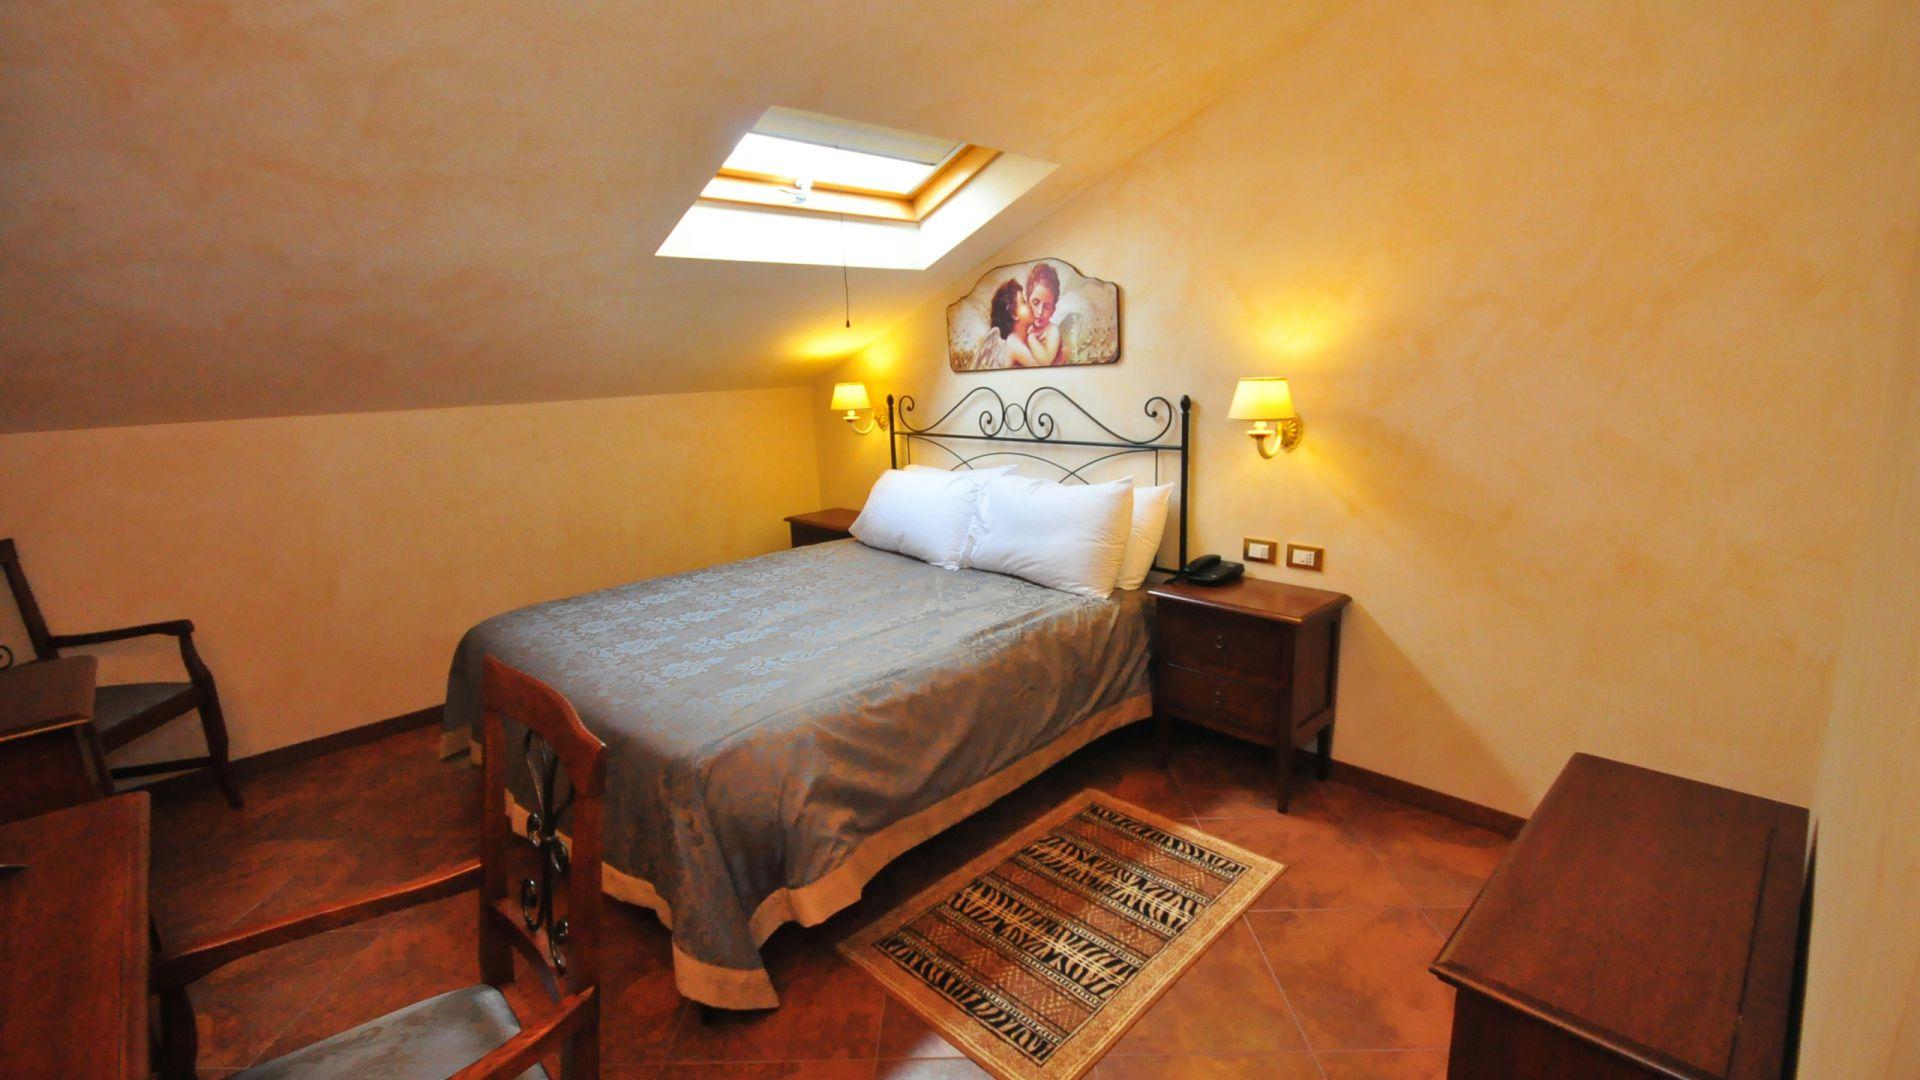 oc-casali-rome-rooms-08